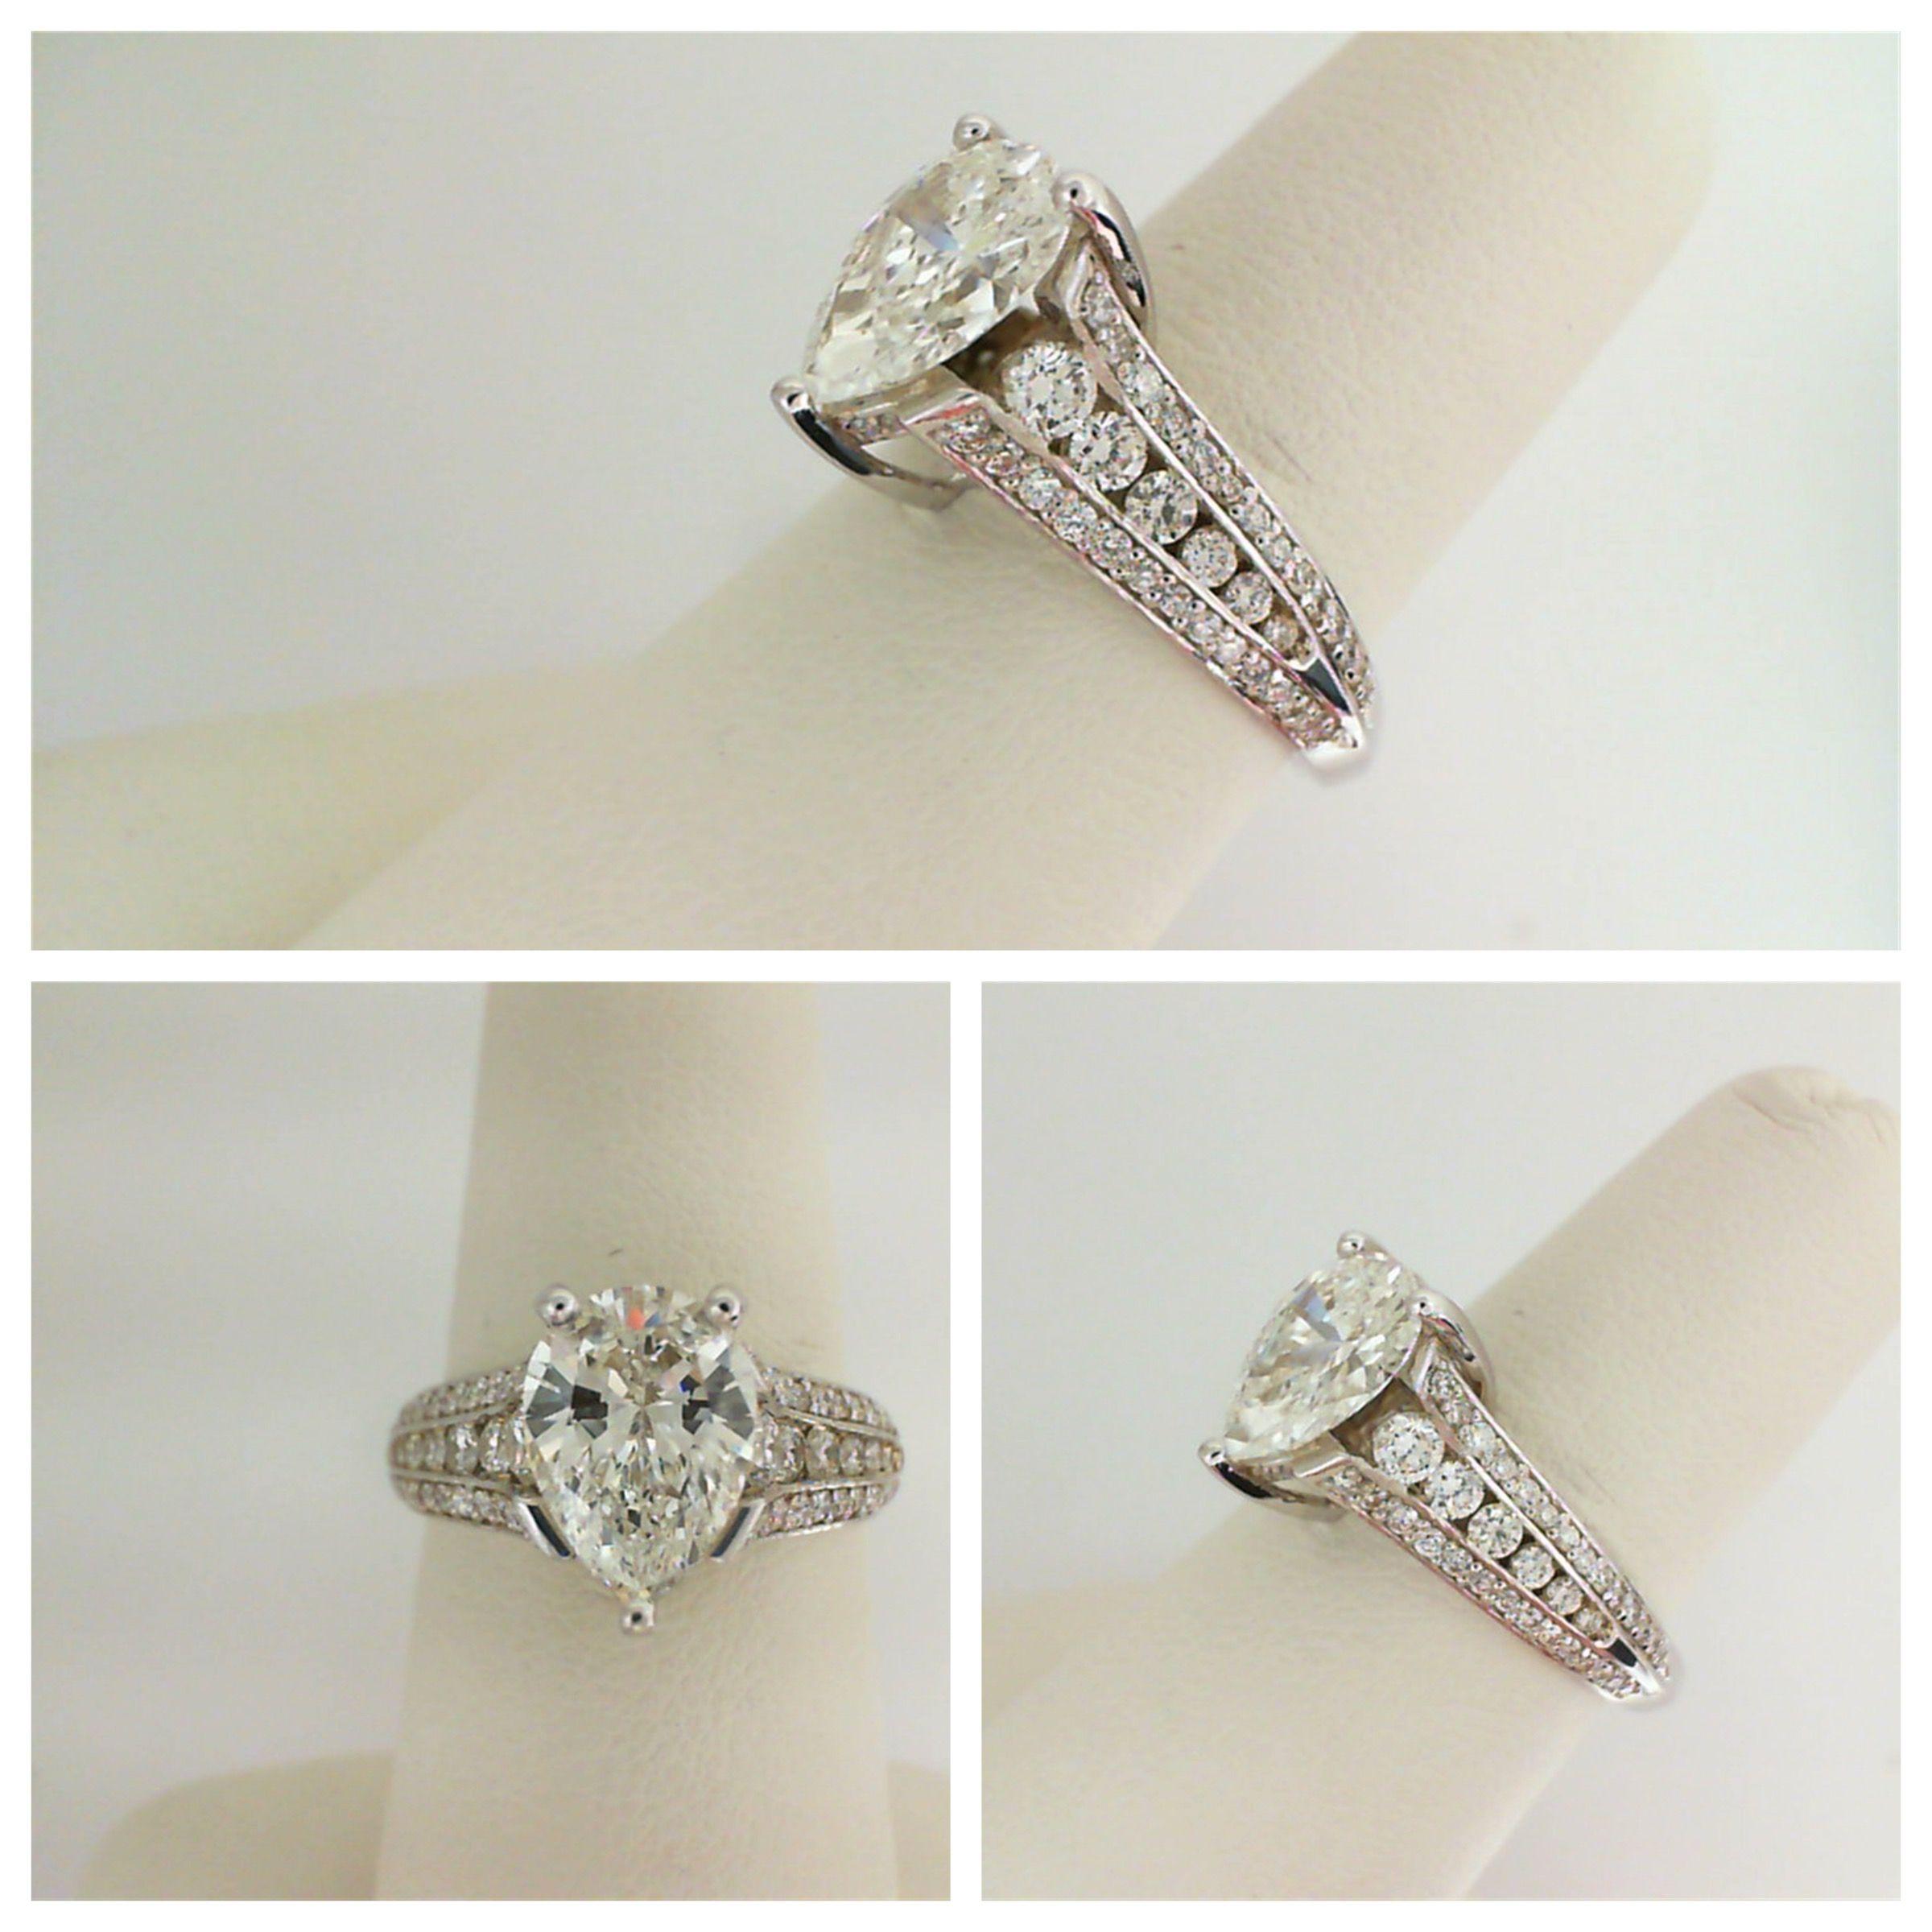 30+ Pear shaped wedding ring ideas in 2021